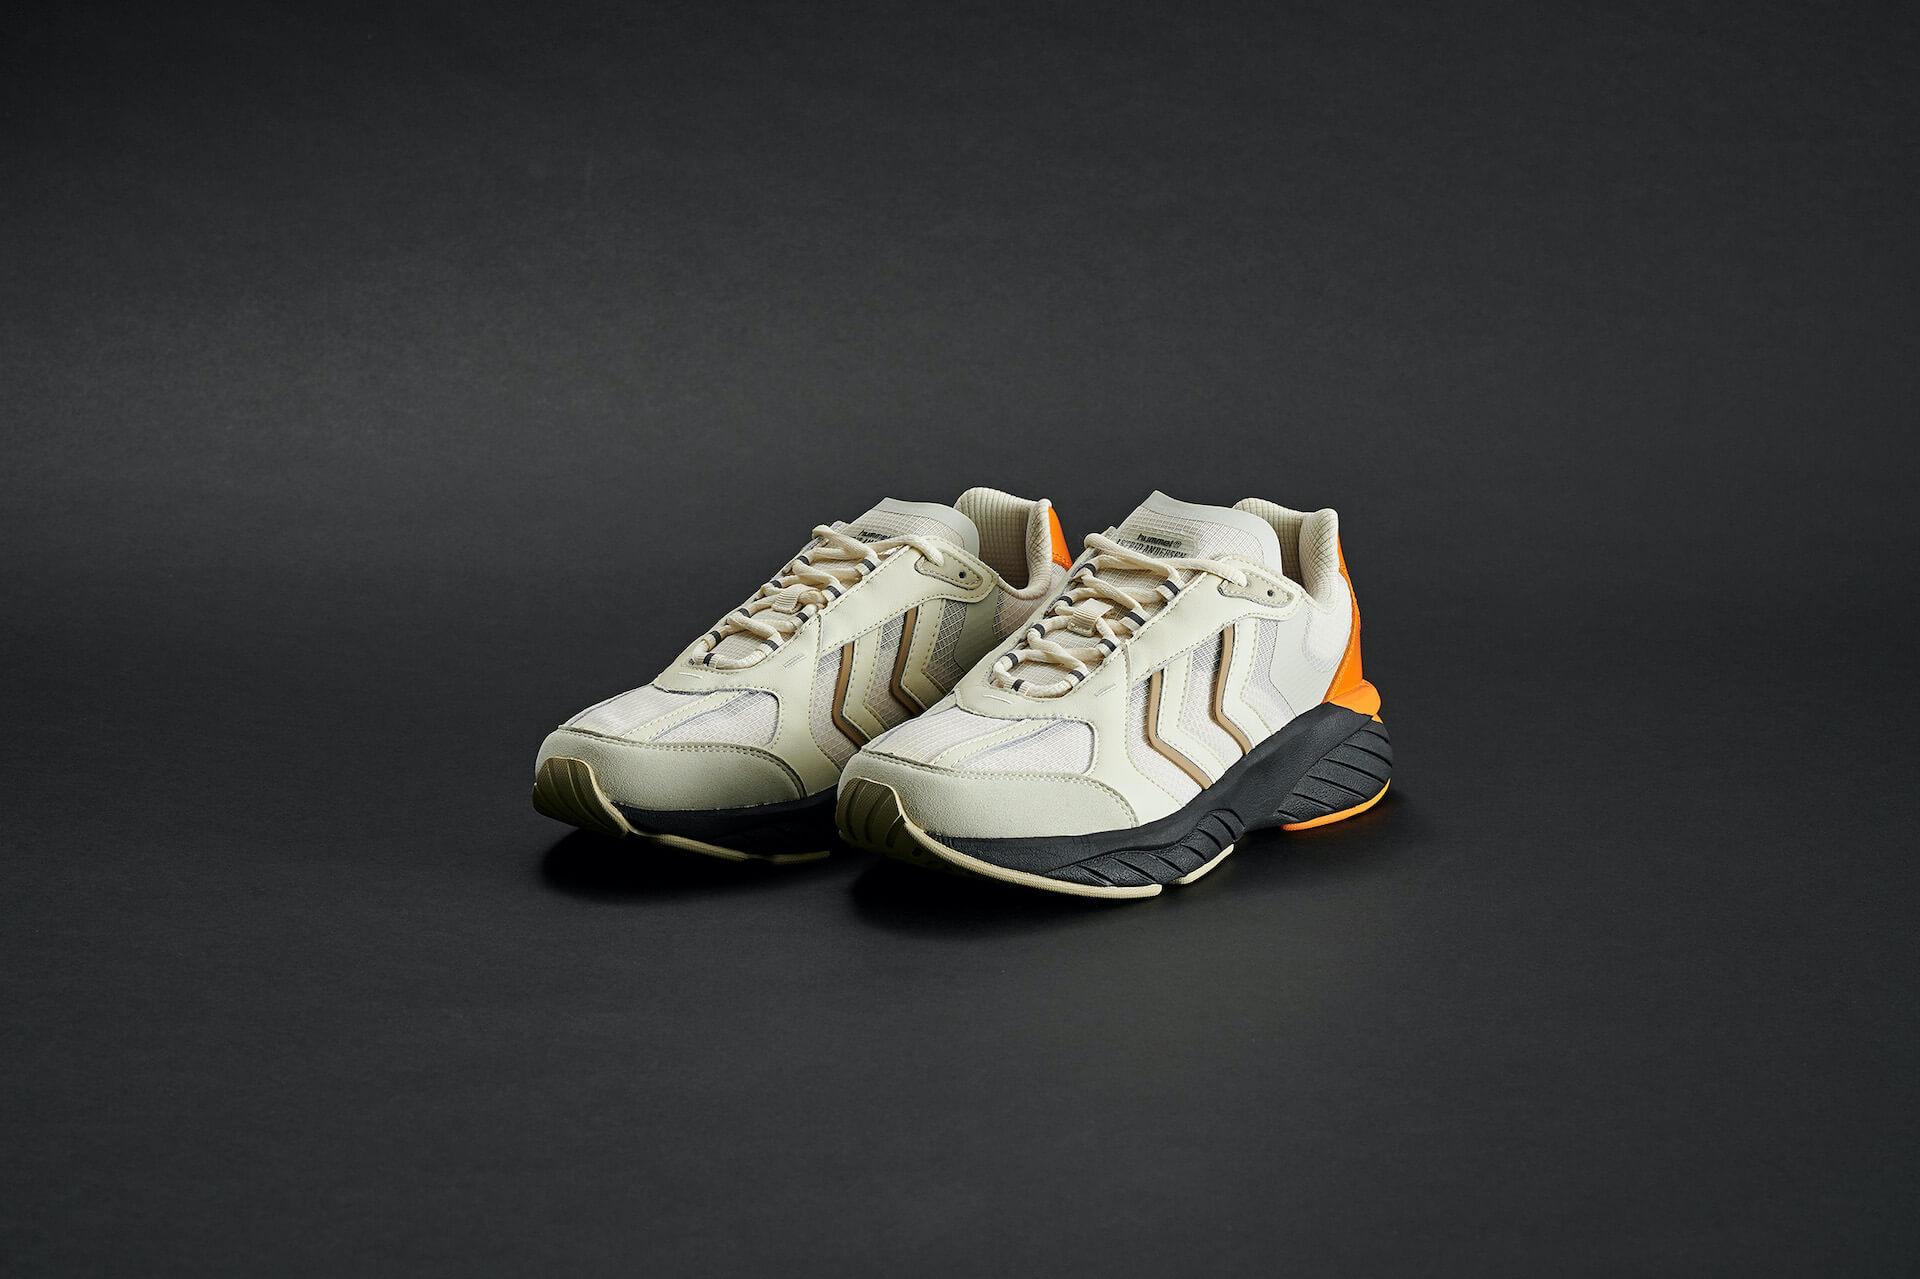 HUMMEL HIVEとASTRID ANDERSENのコラボスニーカーが東京・上野のmita sneakers限定で発売! lf200819_hummelhive_astritandersen_04